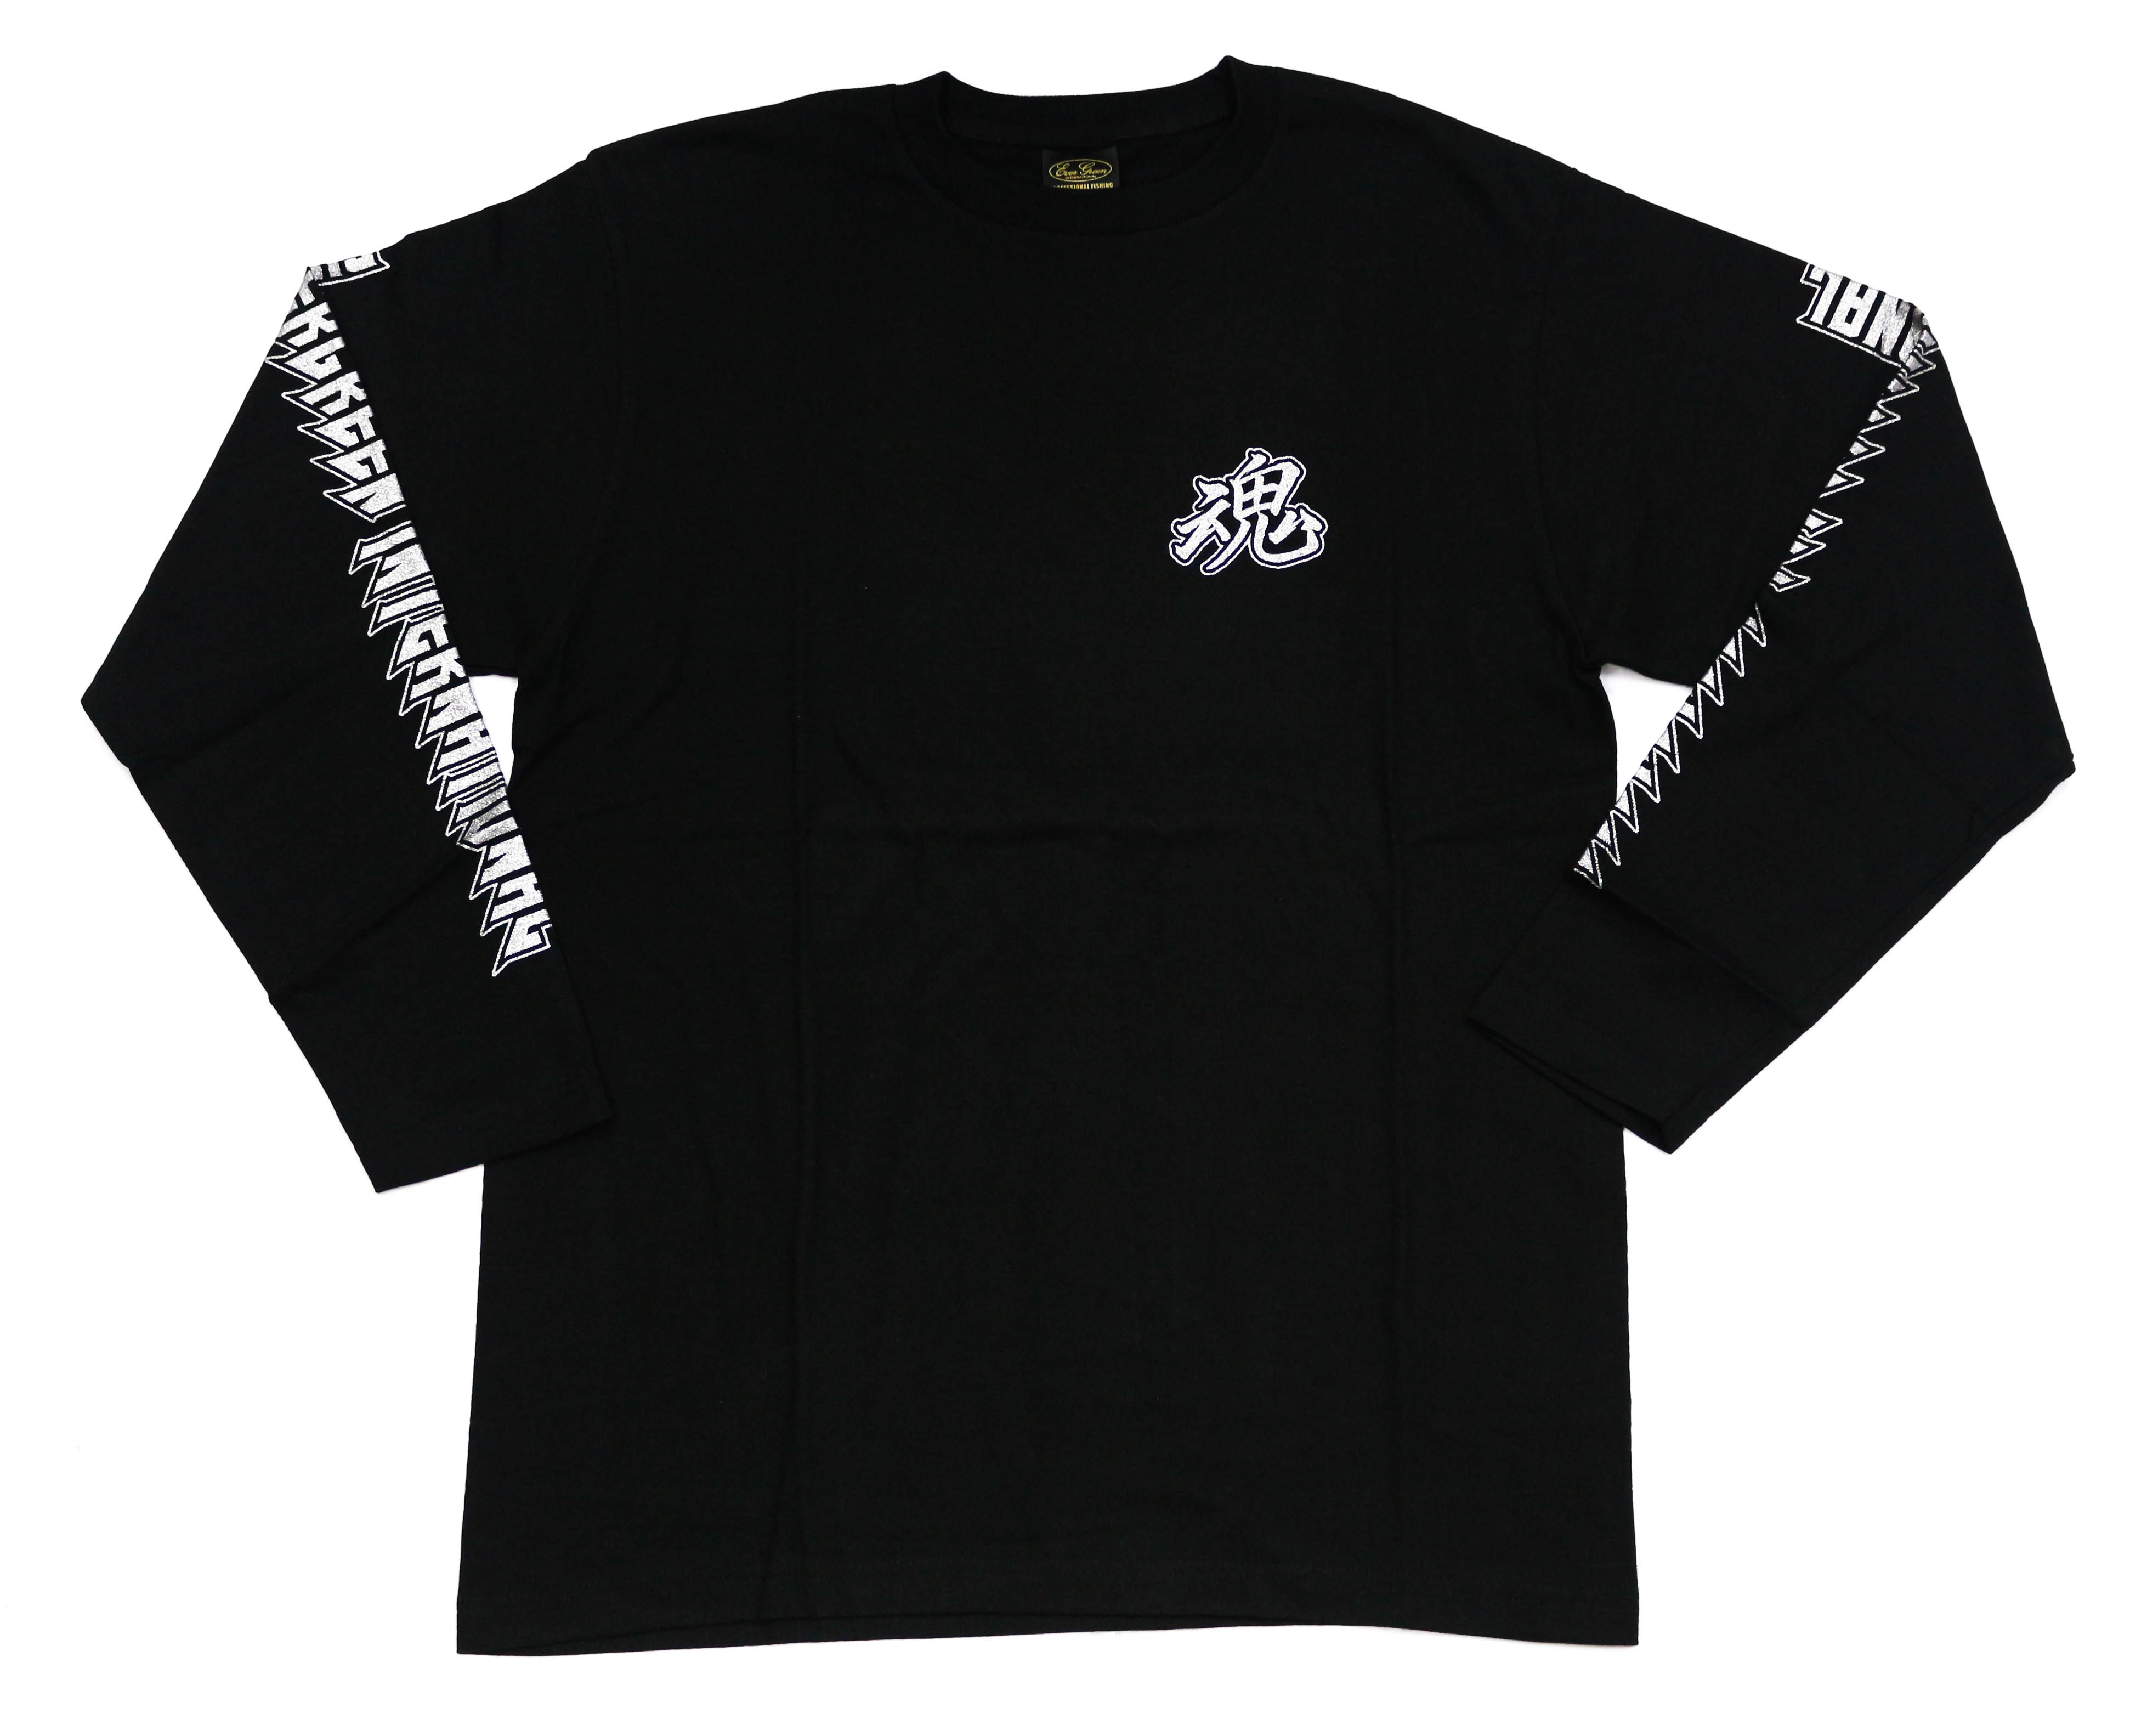 Evergreen T-Shirt Long Sleeve Metal Soul A Type Size L Black (7618)